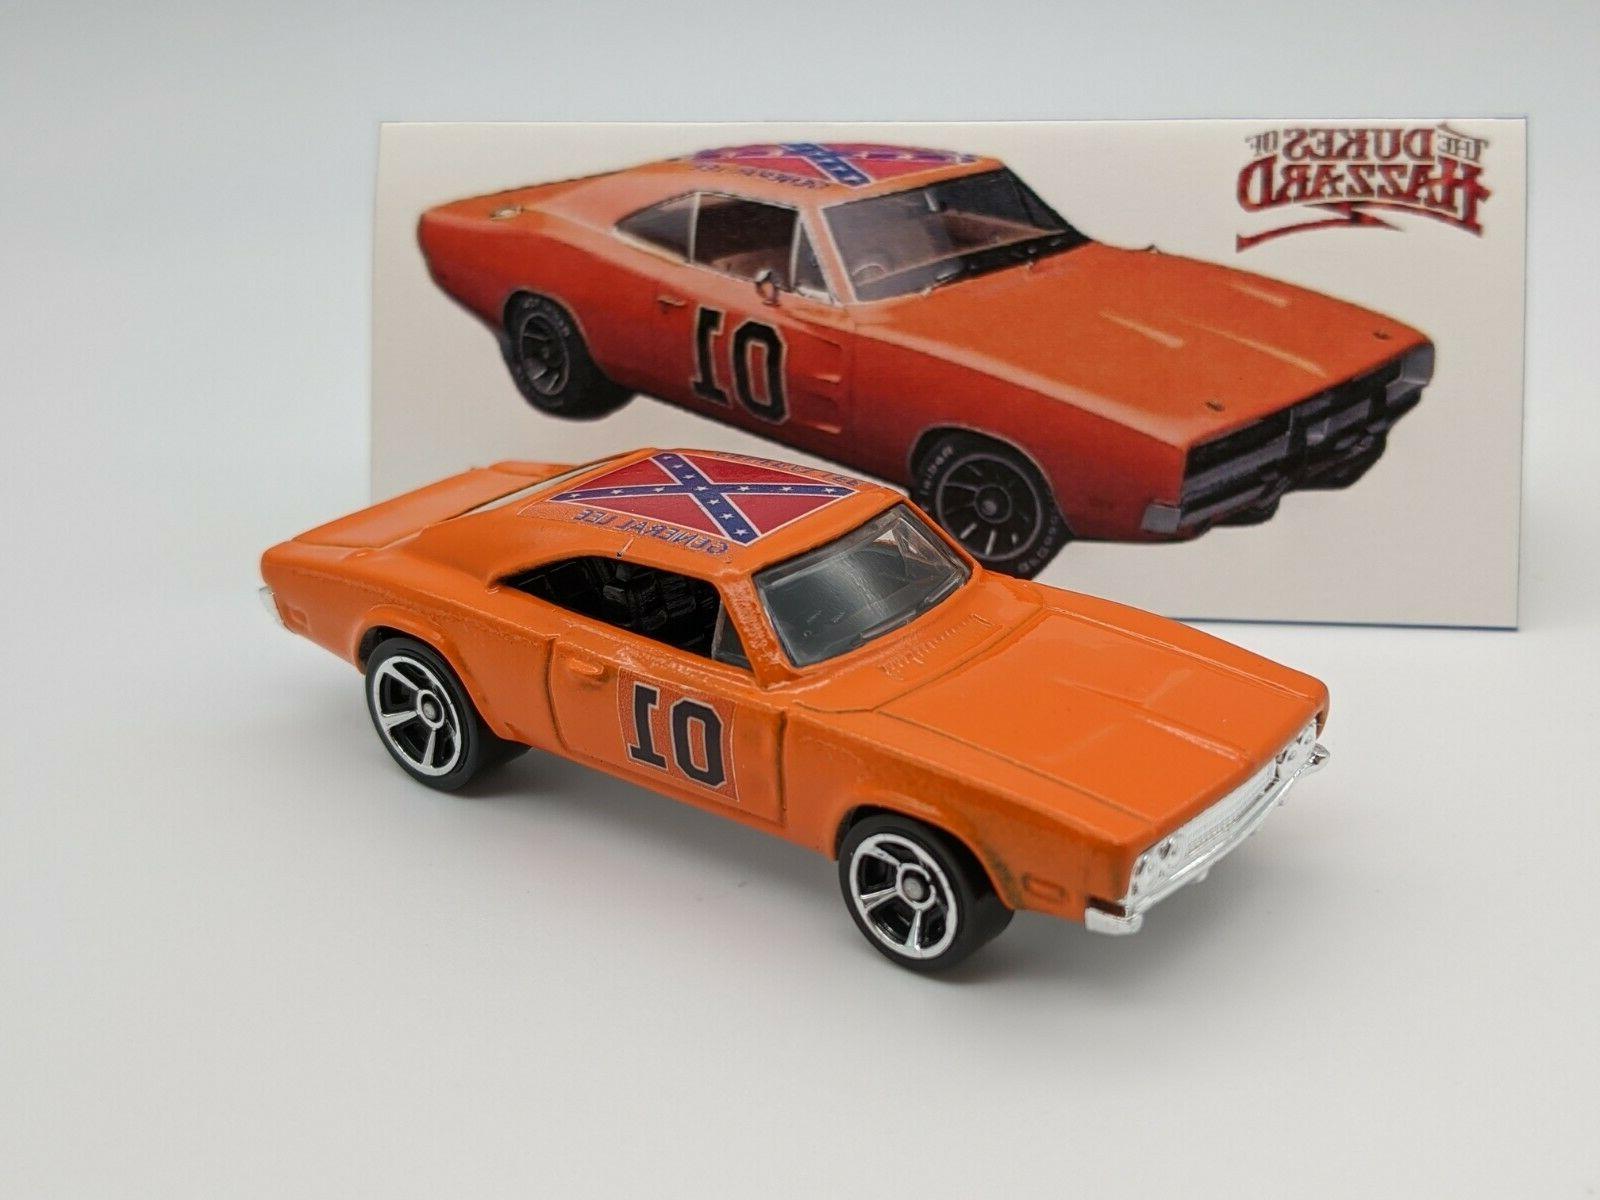 Hot Custom of Hazzard 1969 500